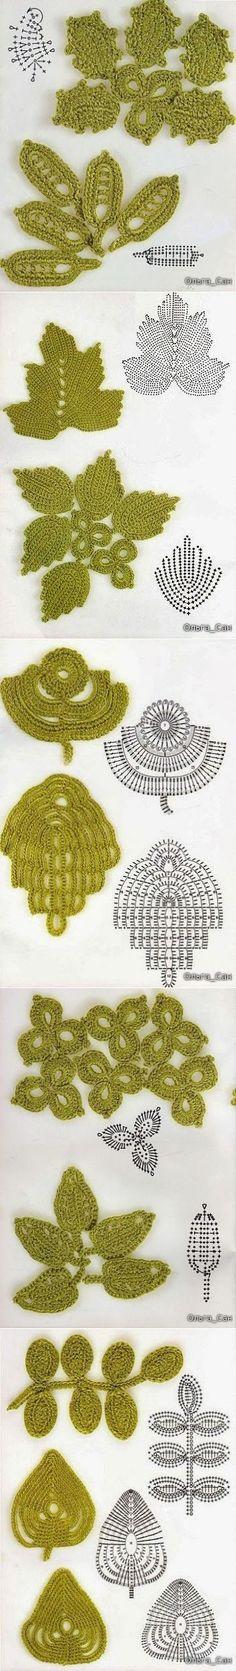 #Crochet_Stitches -- Beautiful leaves with charts! Enjoy from #KnittingGuru ** http://www.KnittingGuruDesigns.blogspot.com